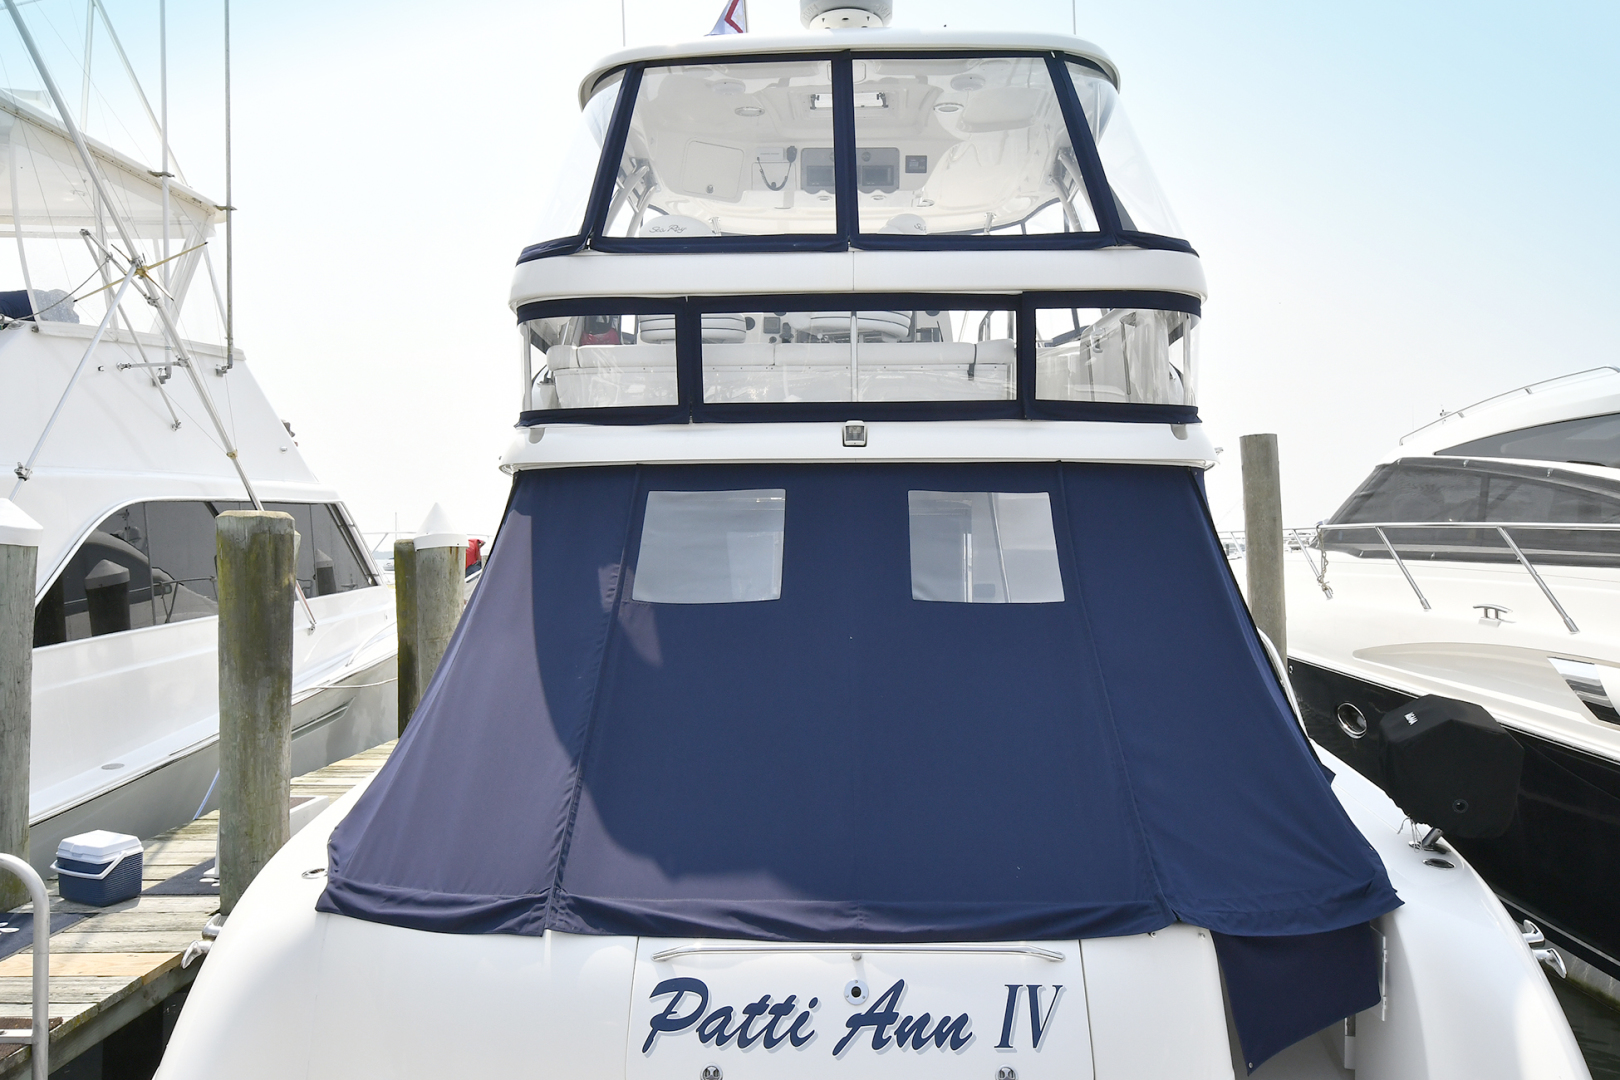 Sea Ray-58 Sedan Bridge 2007-Patti Ann IV Montauk-New York-United States-Canvas-1116857 | Thumbnail